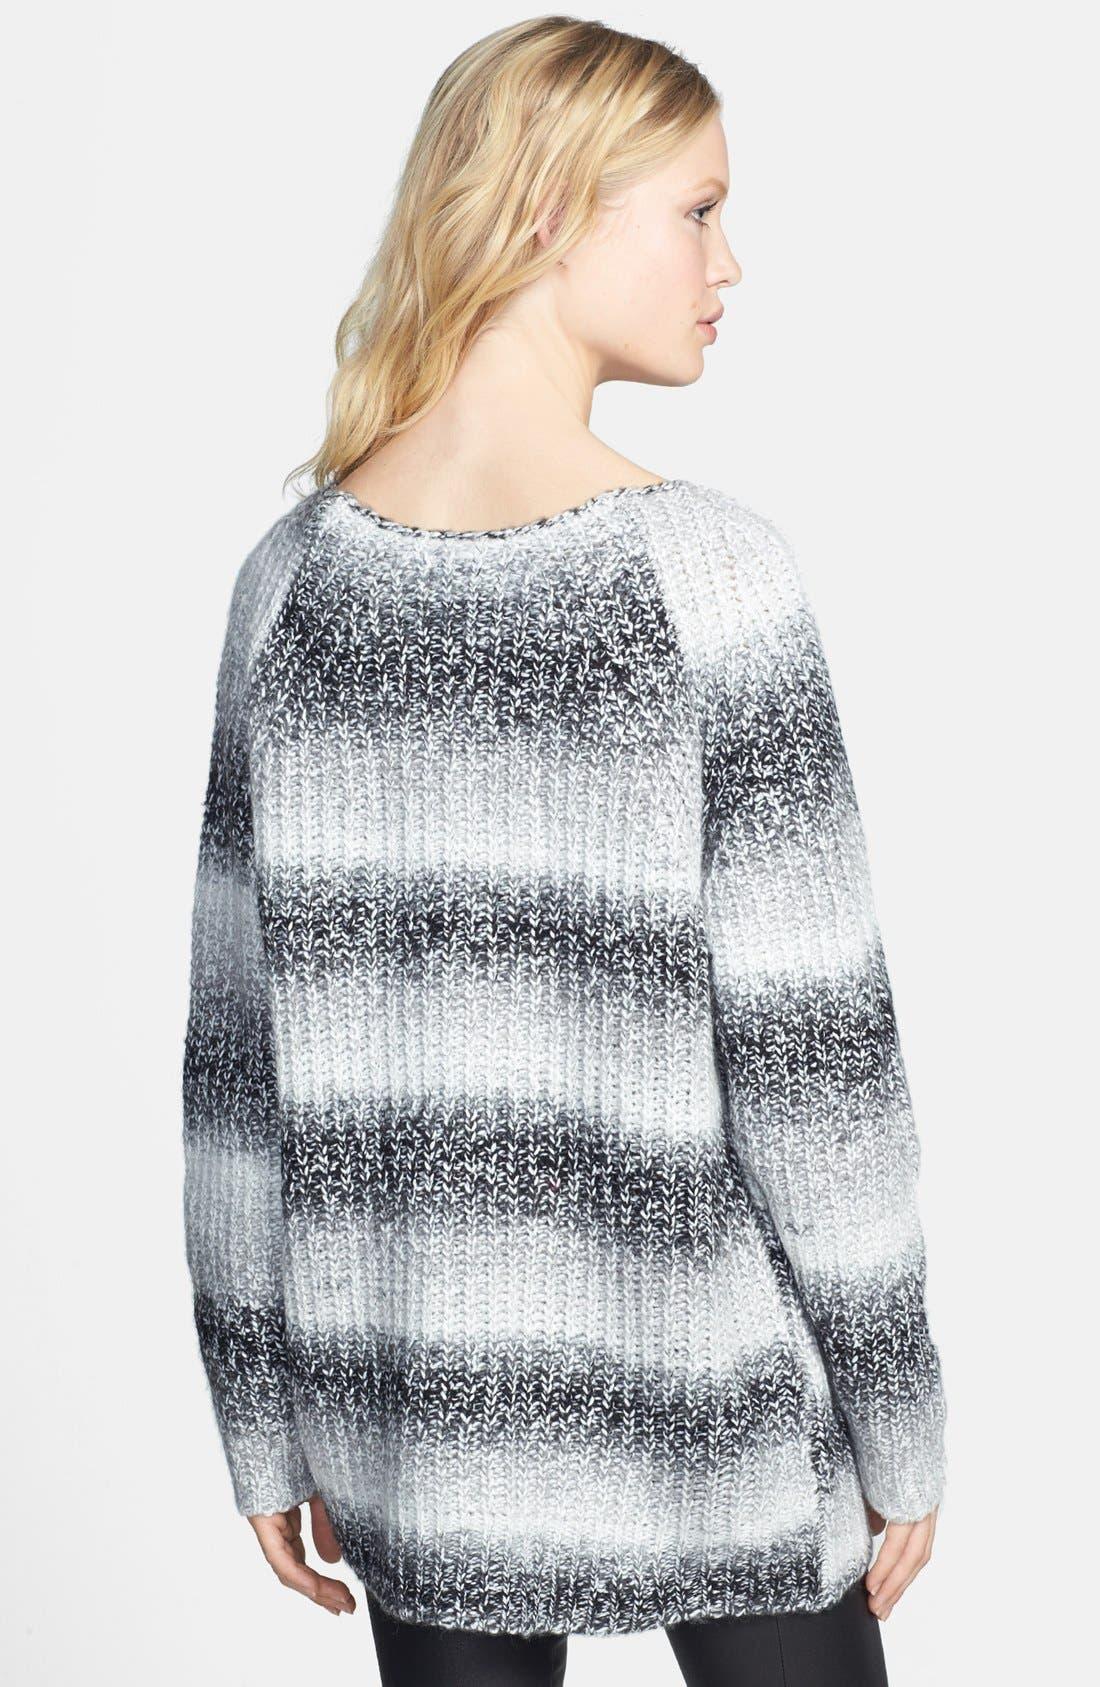 Alternate Image 2  - ELEVENPARIS 'Tinter' Destroyed Marled Sweater